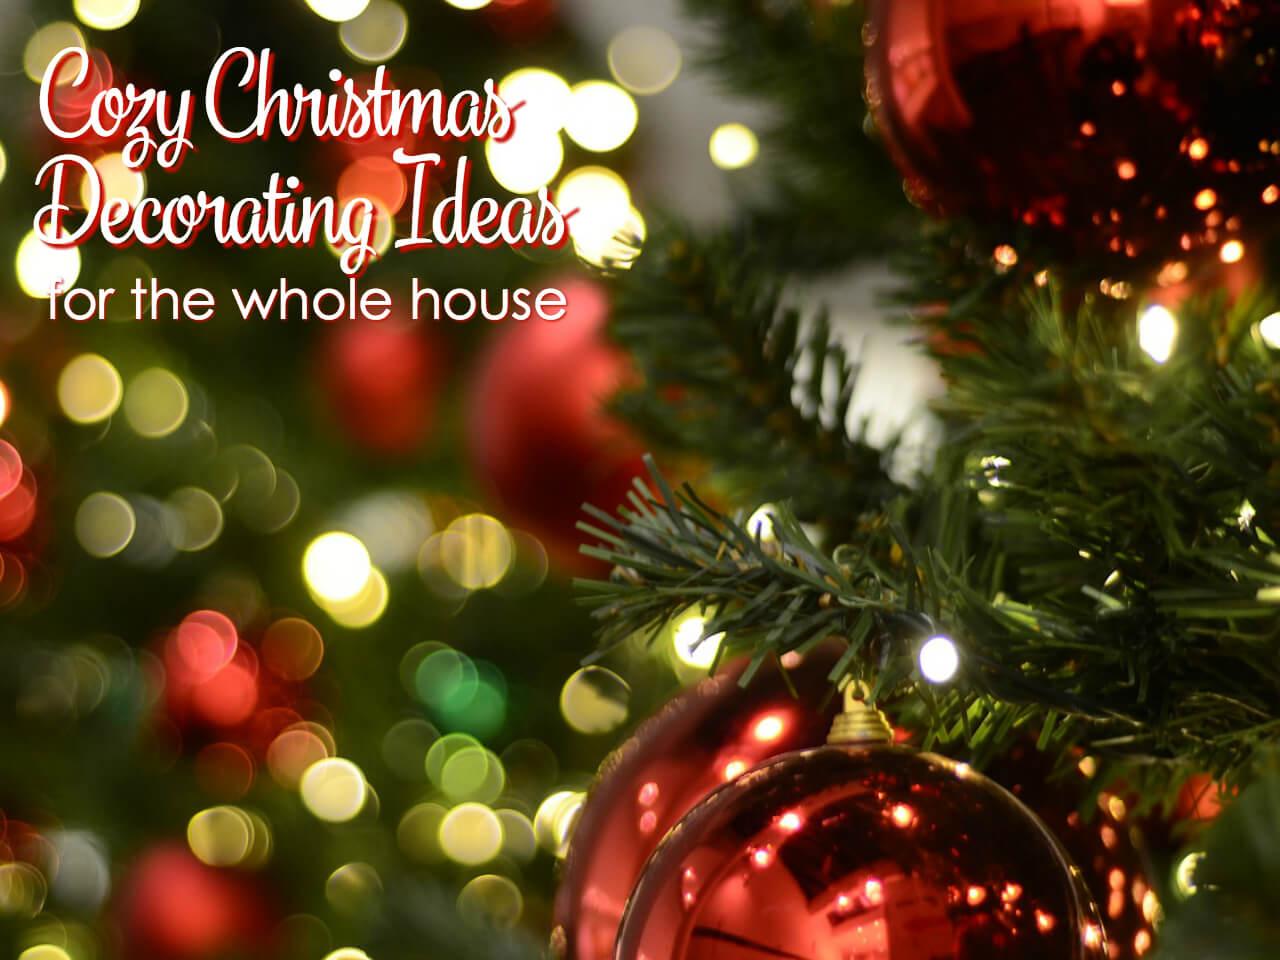 More cozy Christmas decorating ideas & Cozy Christmas Decorating Ideas | It Is a Keeper